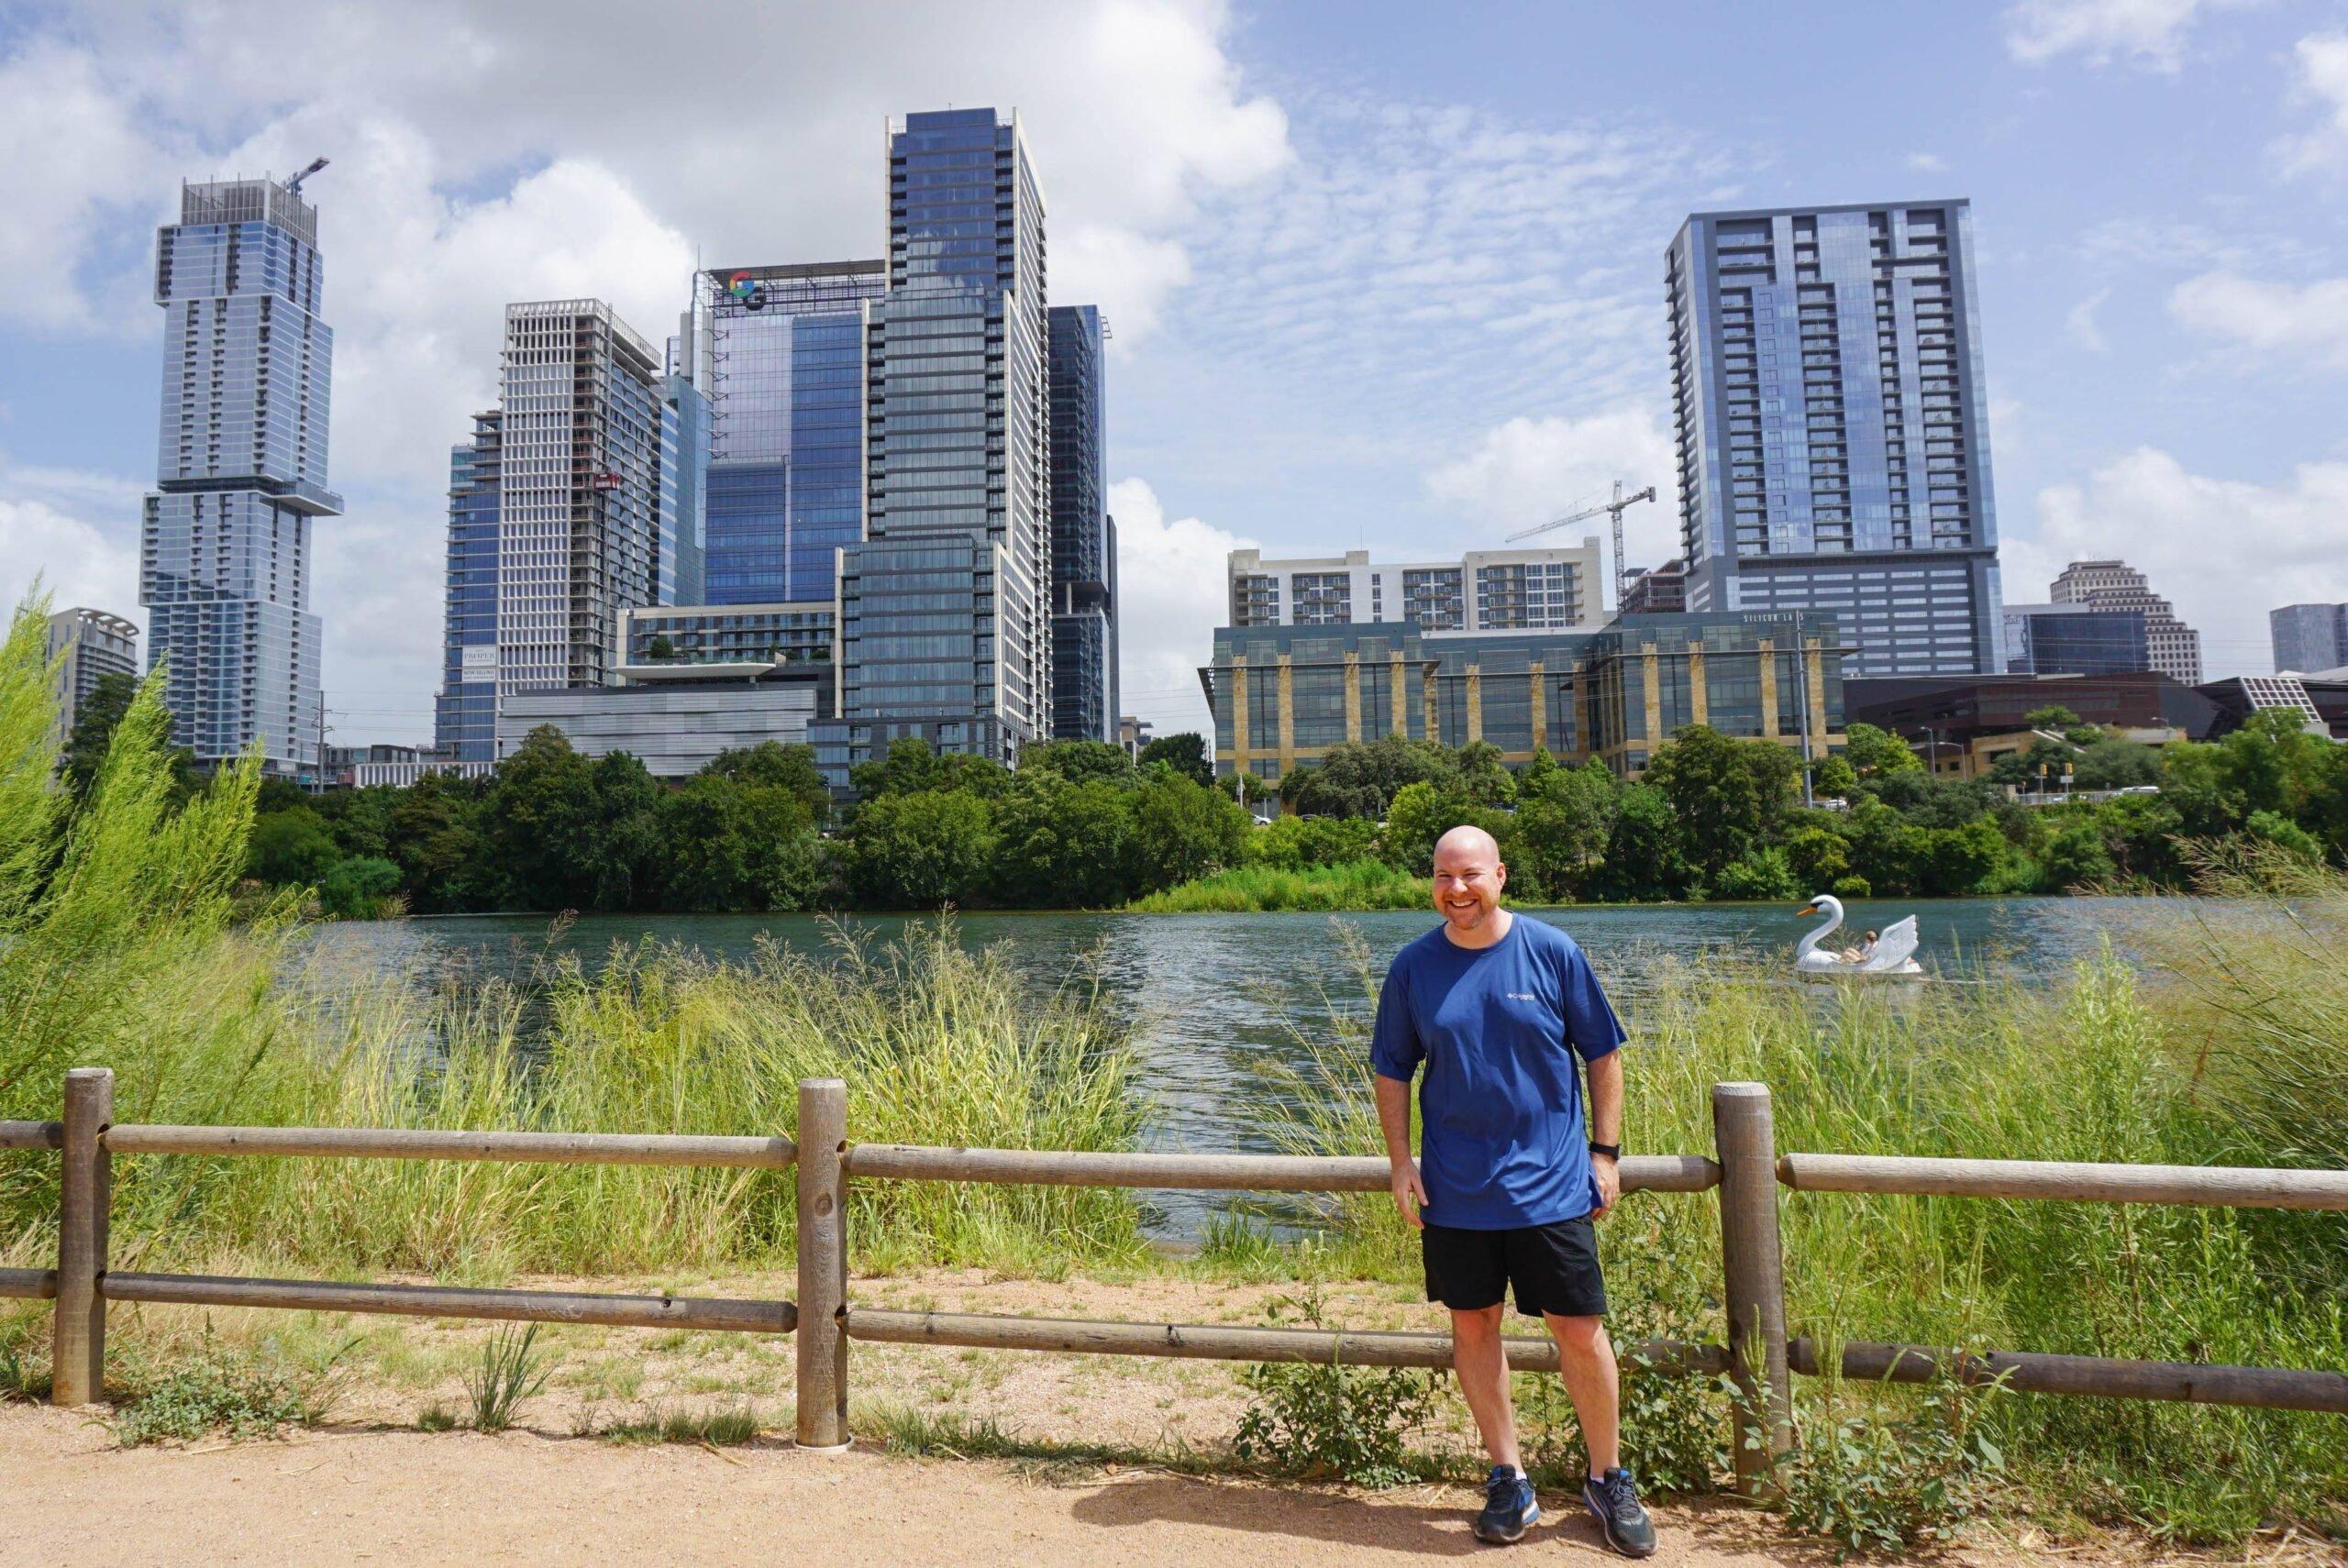 Staying cool in Austin with Columbia sportswear on a walk around Ladybird Lake